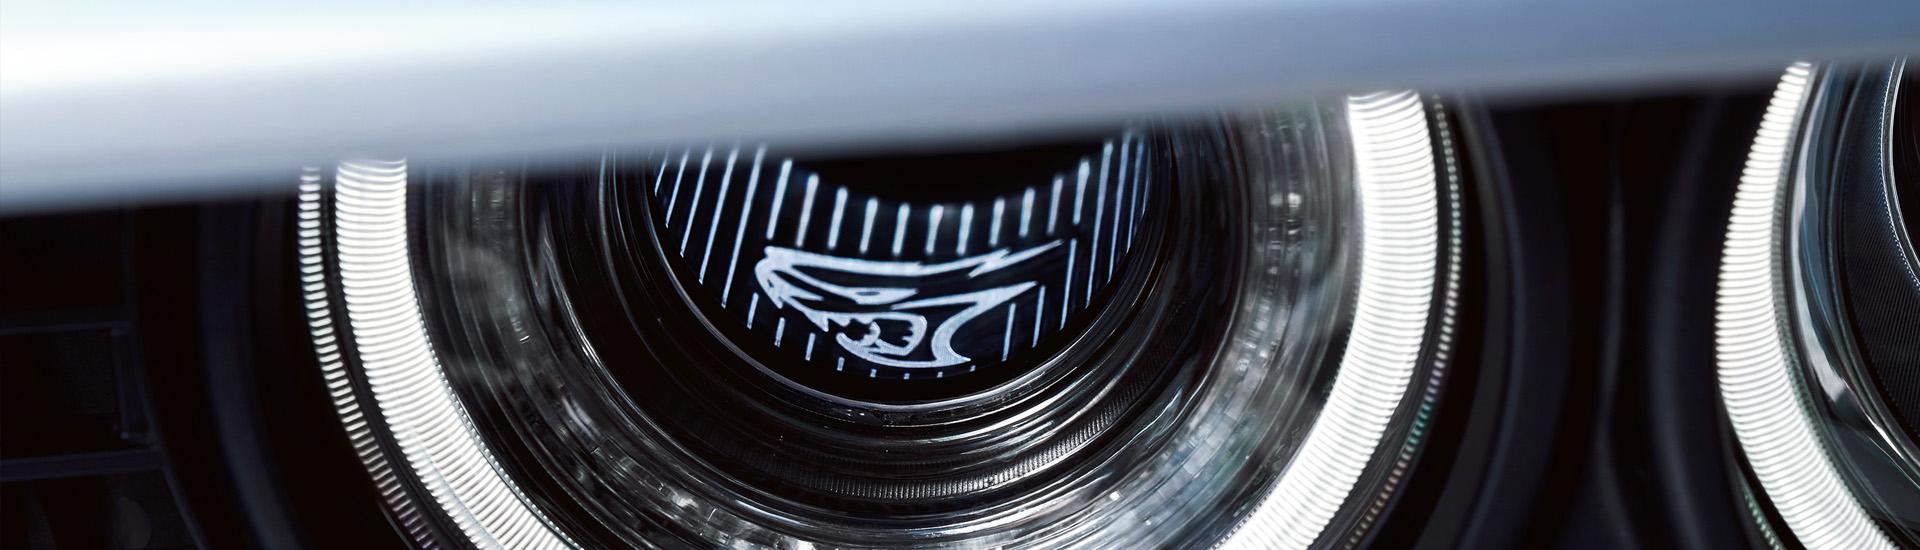 Dodge Challenger SRT Hellcat verkstad